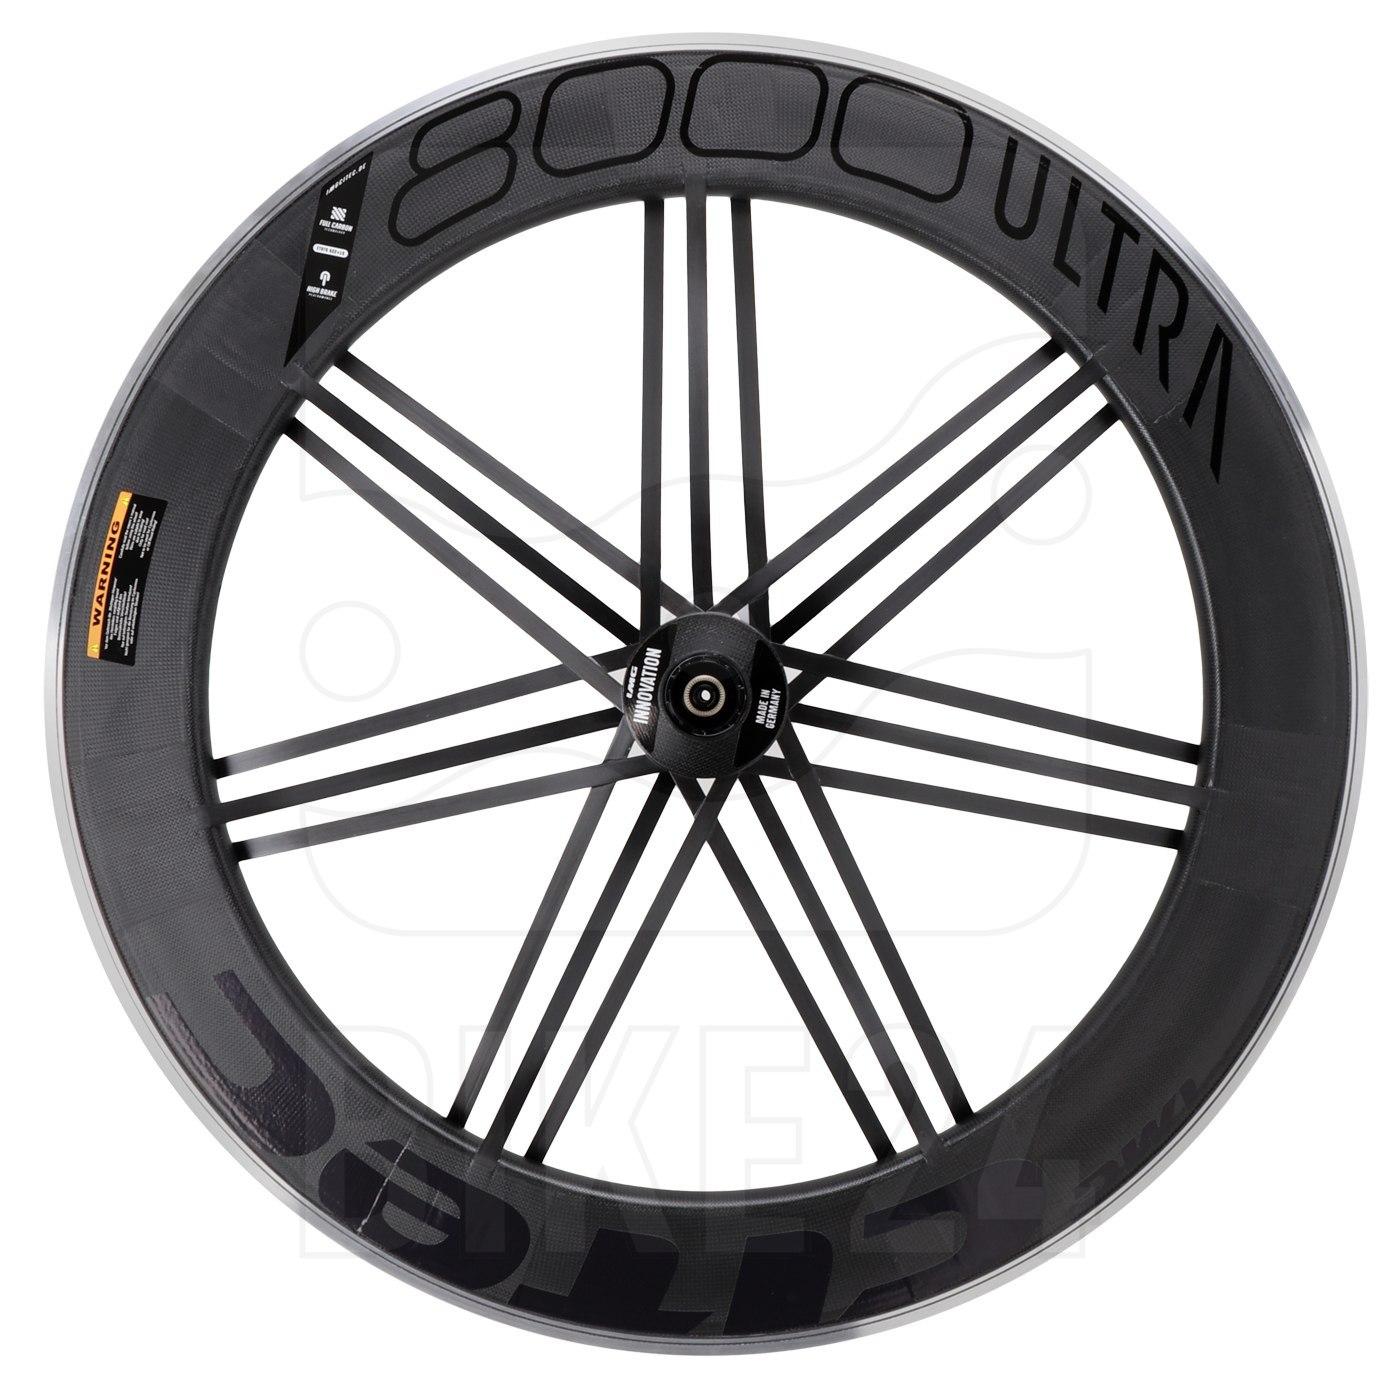 CITEC 8000 SL / 80 Ultra 28 Inch Rear Wheel - Clincher - 10x130mm QR - black